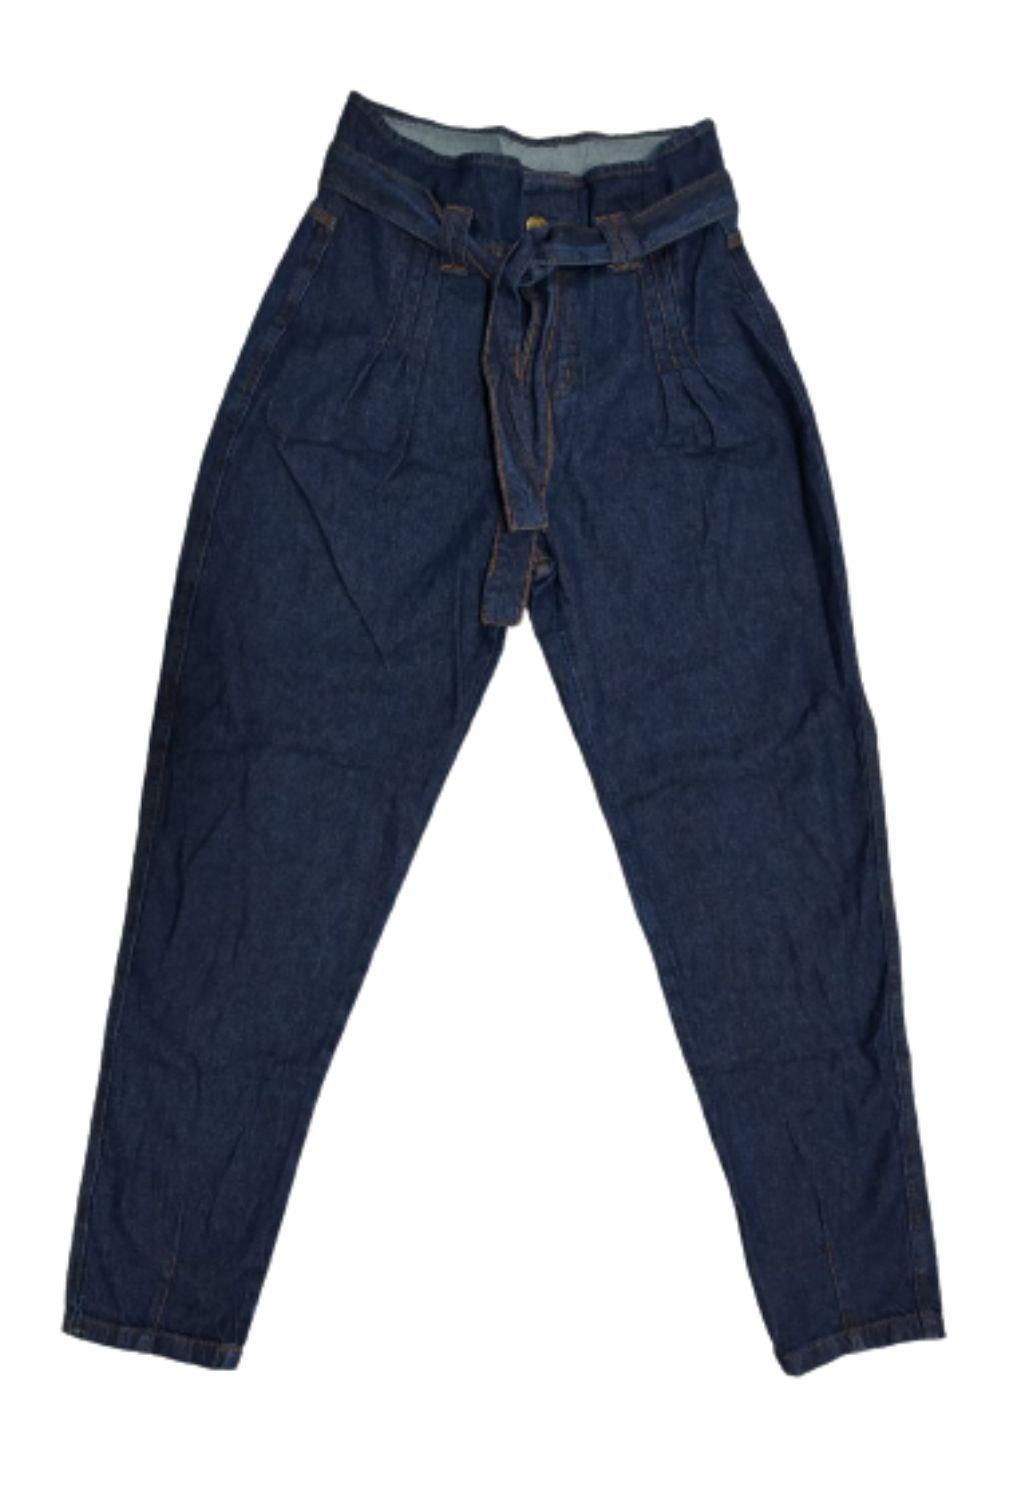 Calça Jeans Escuro Feminina Mom Baggy  - ModaStore | Moda Feminina